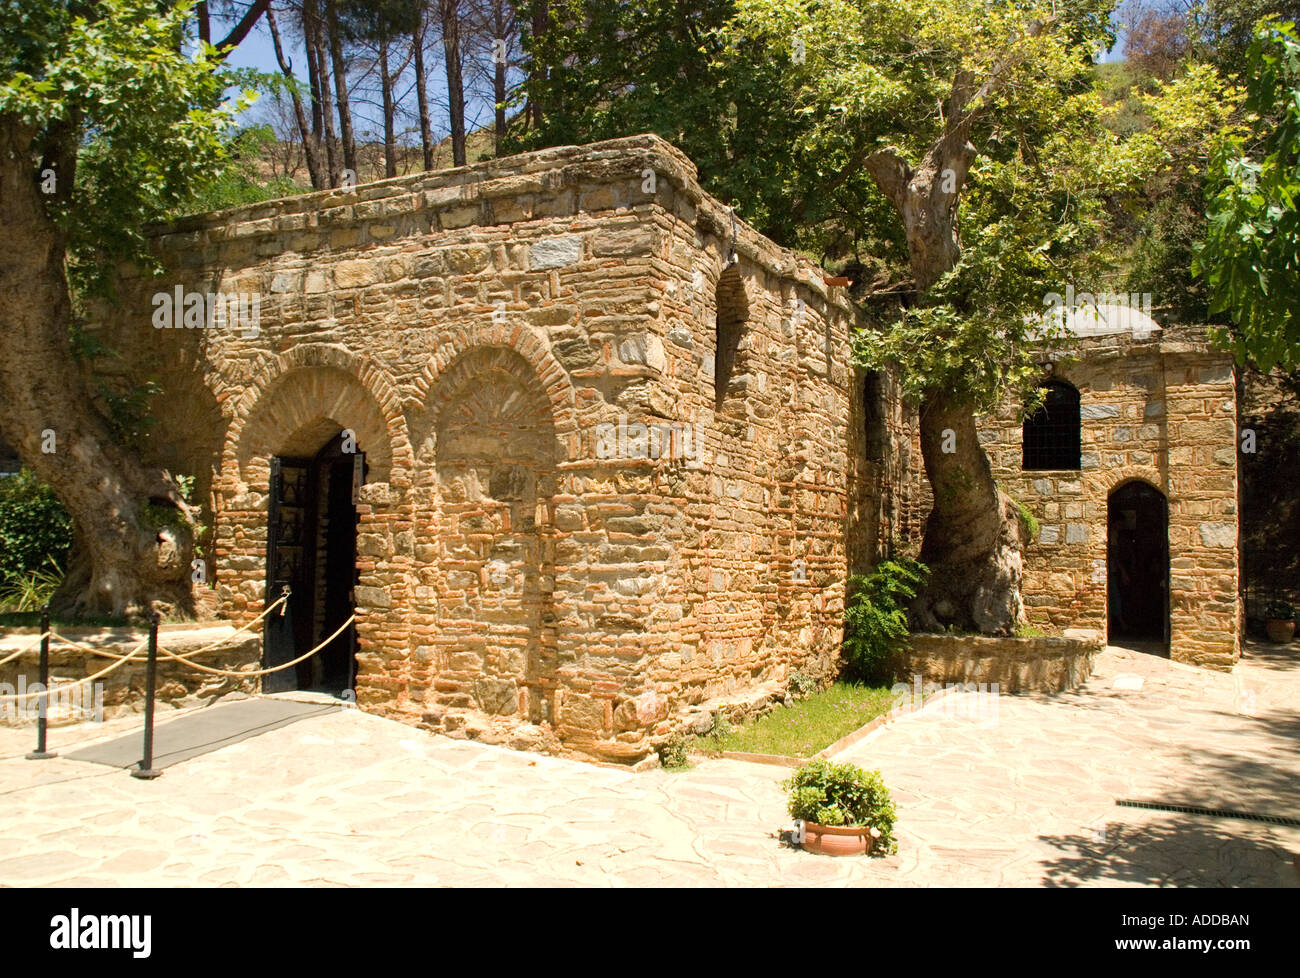 Meryemana, House of the Virgin Mary pilgrimage site, Turkey - Stock Image